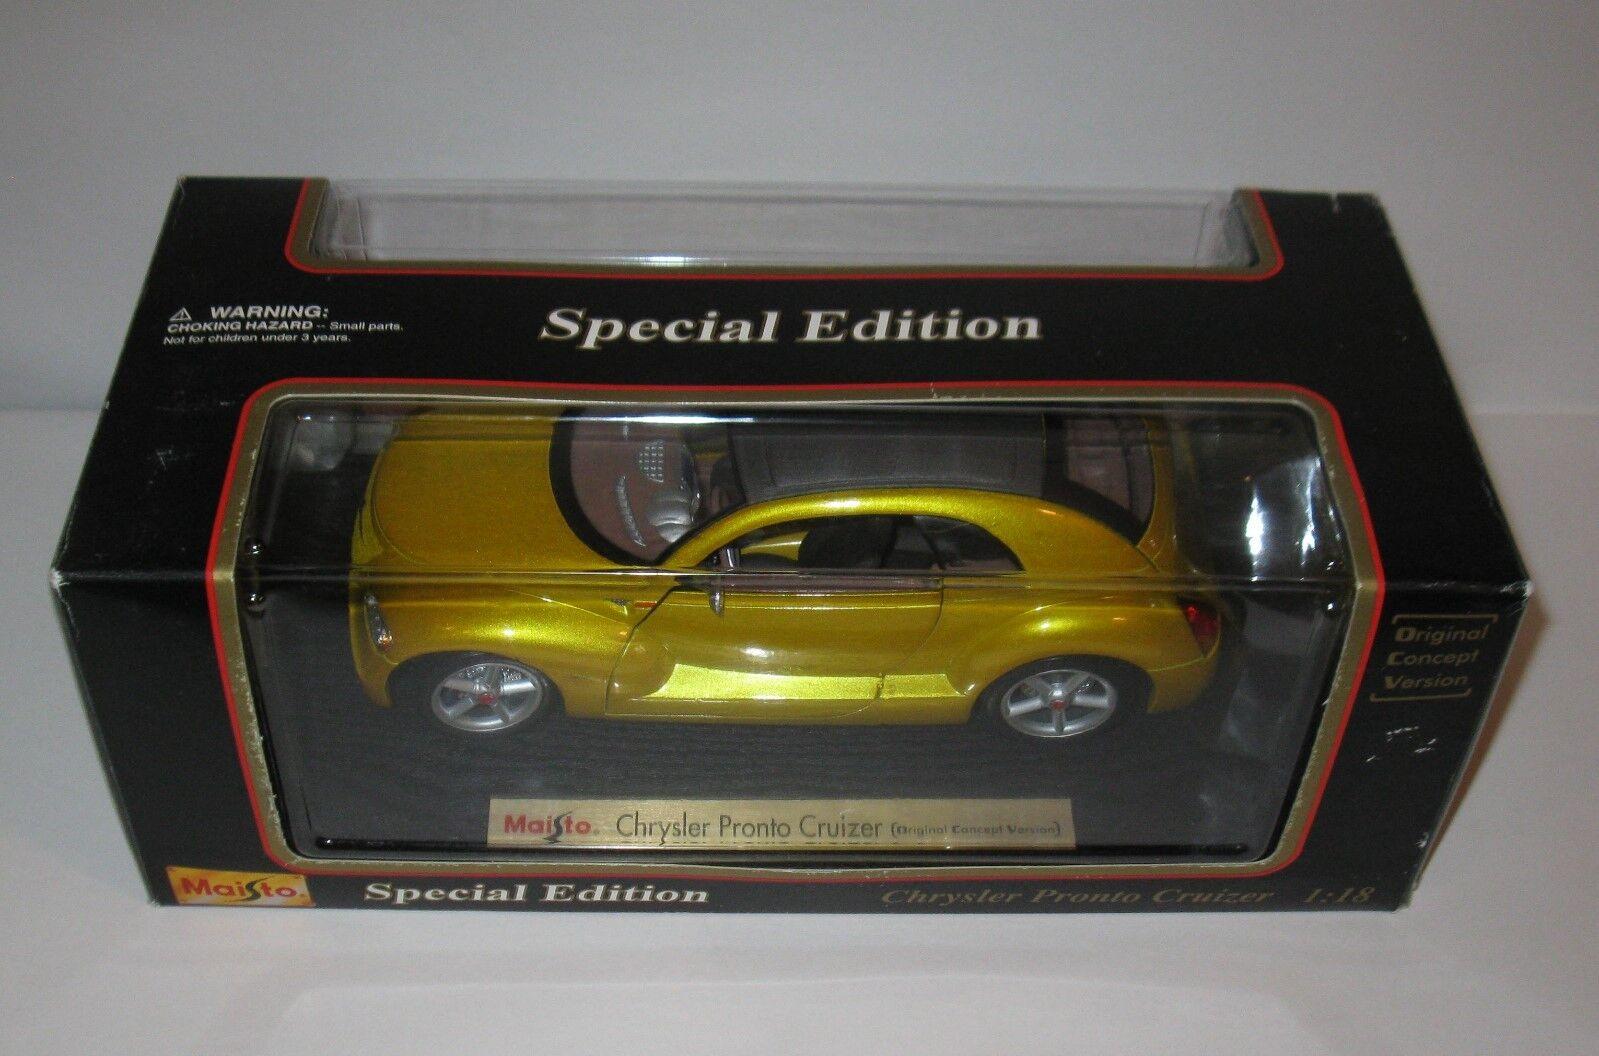 Special Edition Maisto Car Chrysler Pronto Cruizer 1 18  2000's    FREE SHIPPING